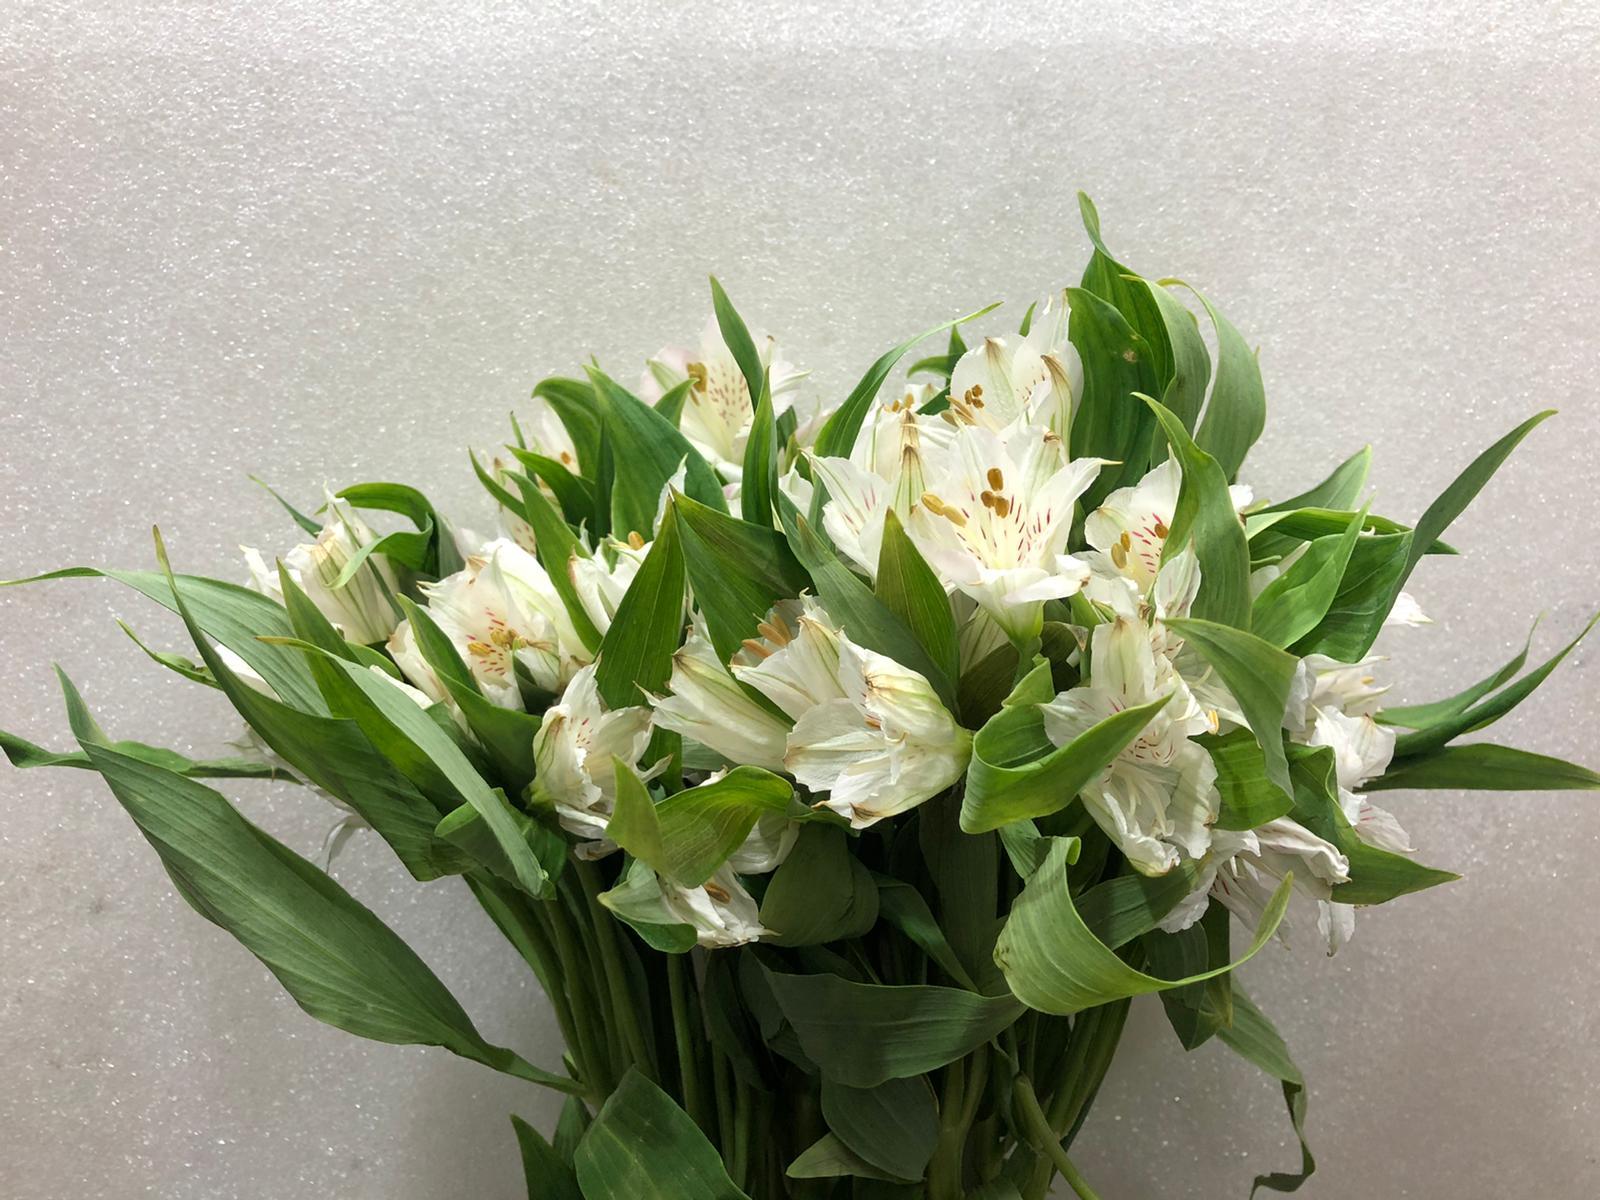 Alstroemeria White Wholesale Flowers Cut Flowers